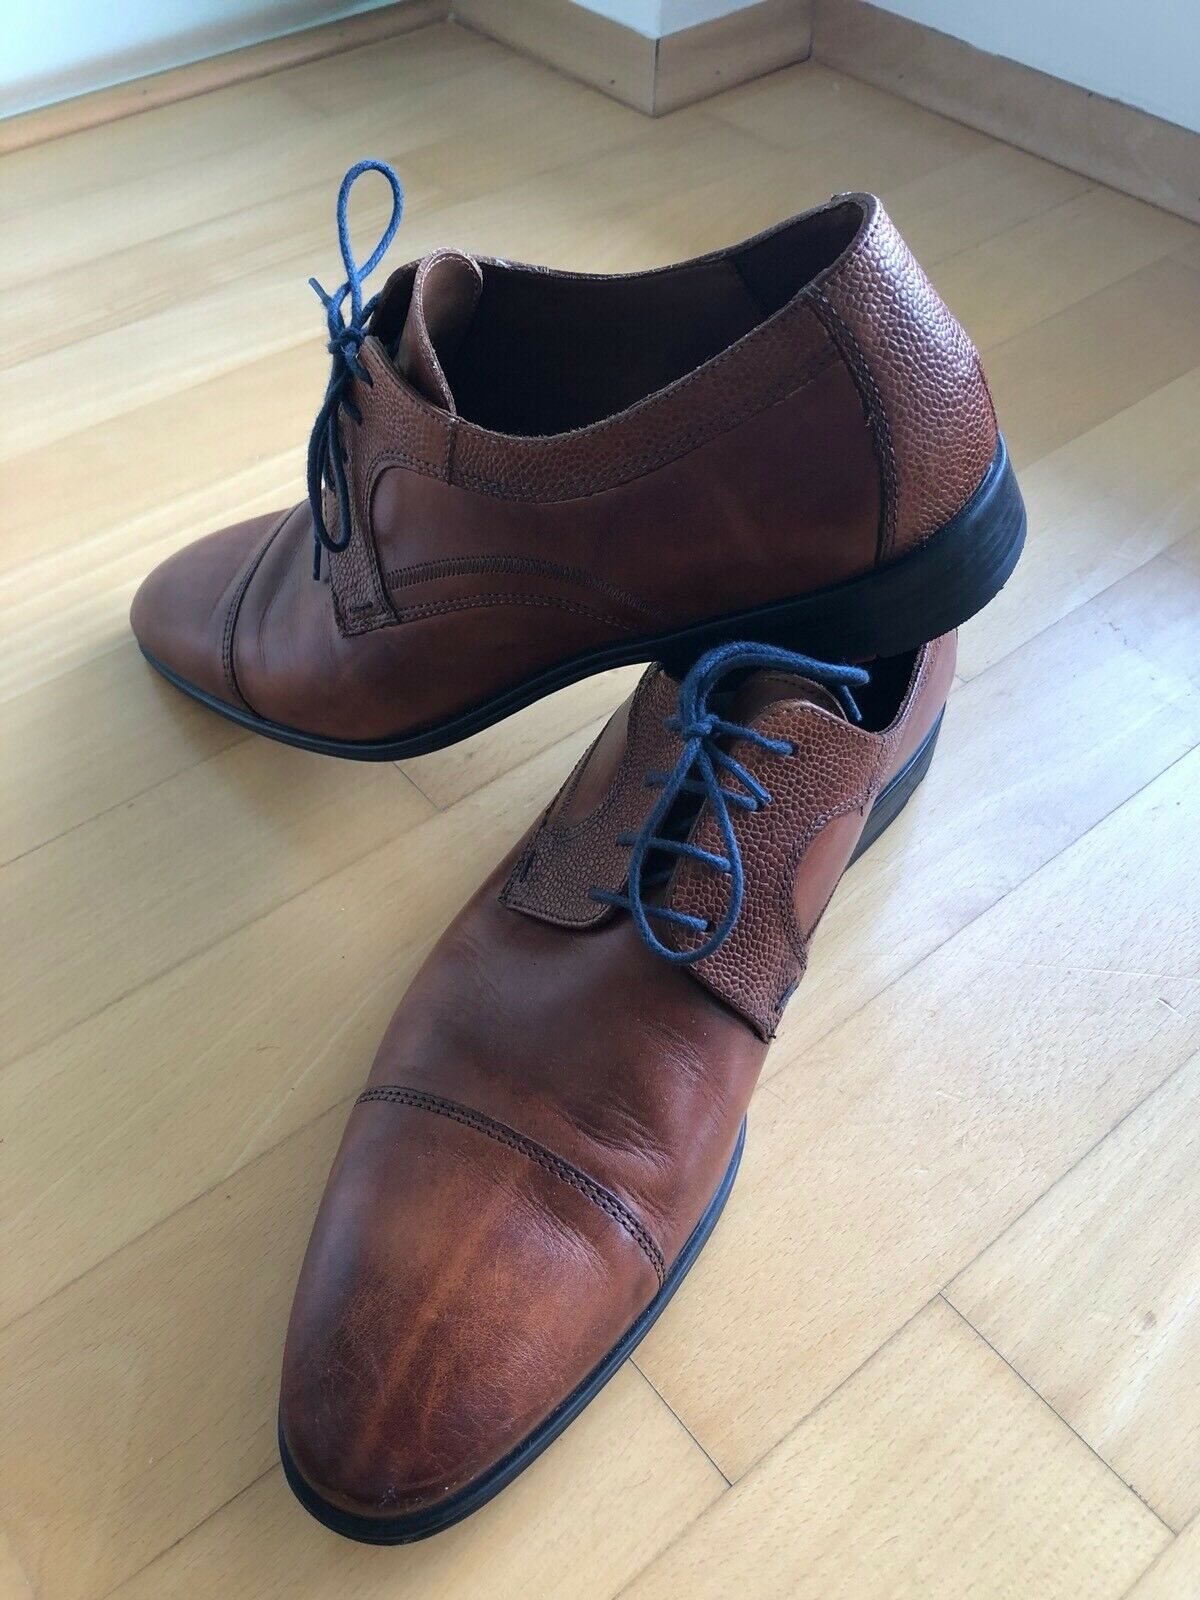 LLoyd Business Schuh ORWIN Größe 44 9,5 Lederschuh